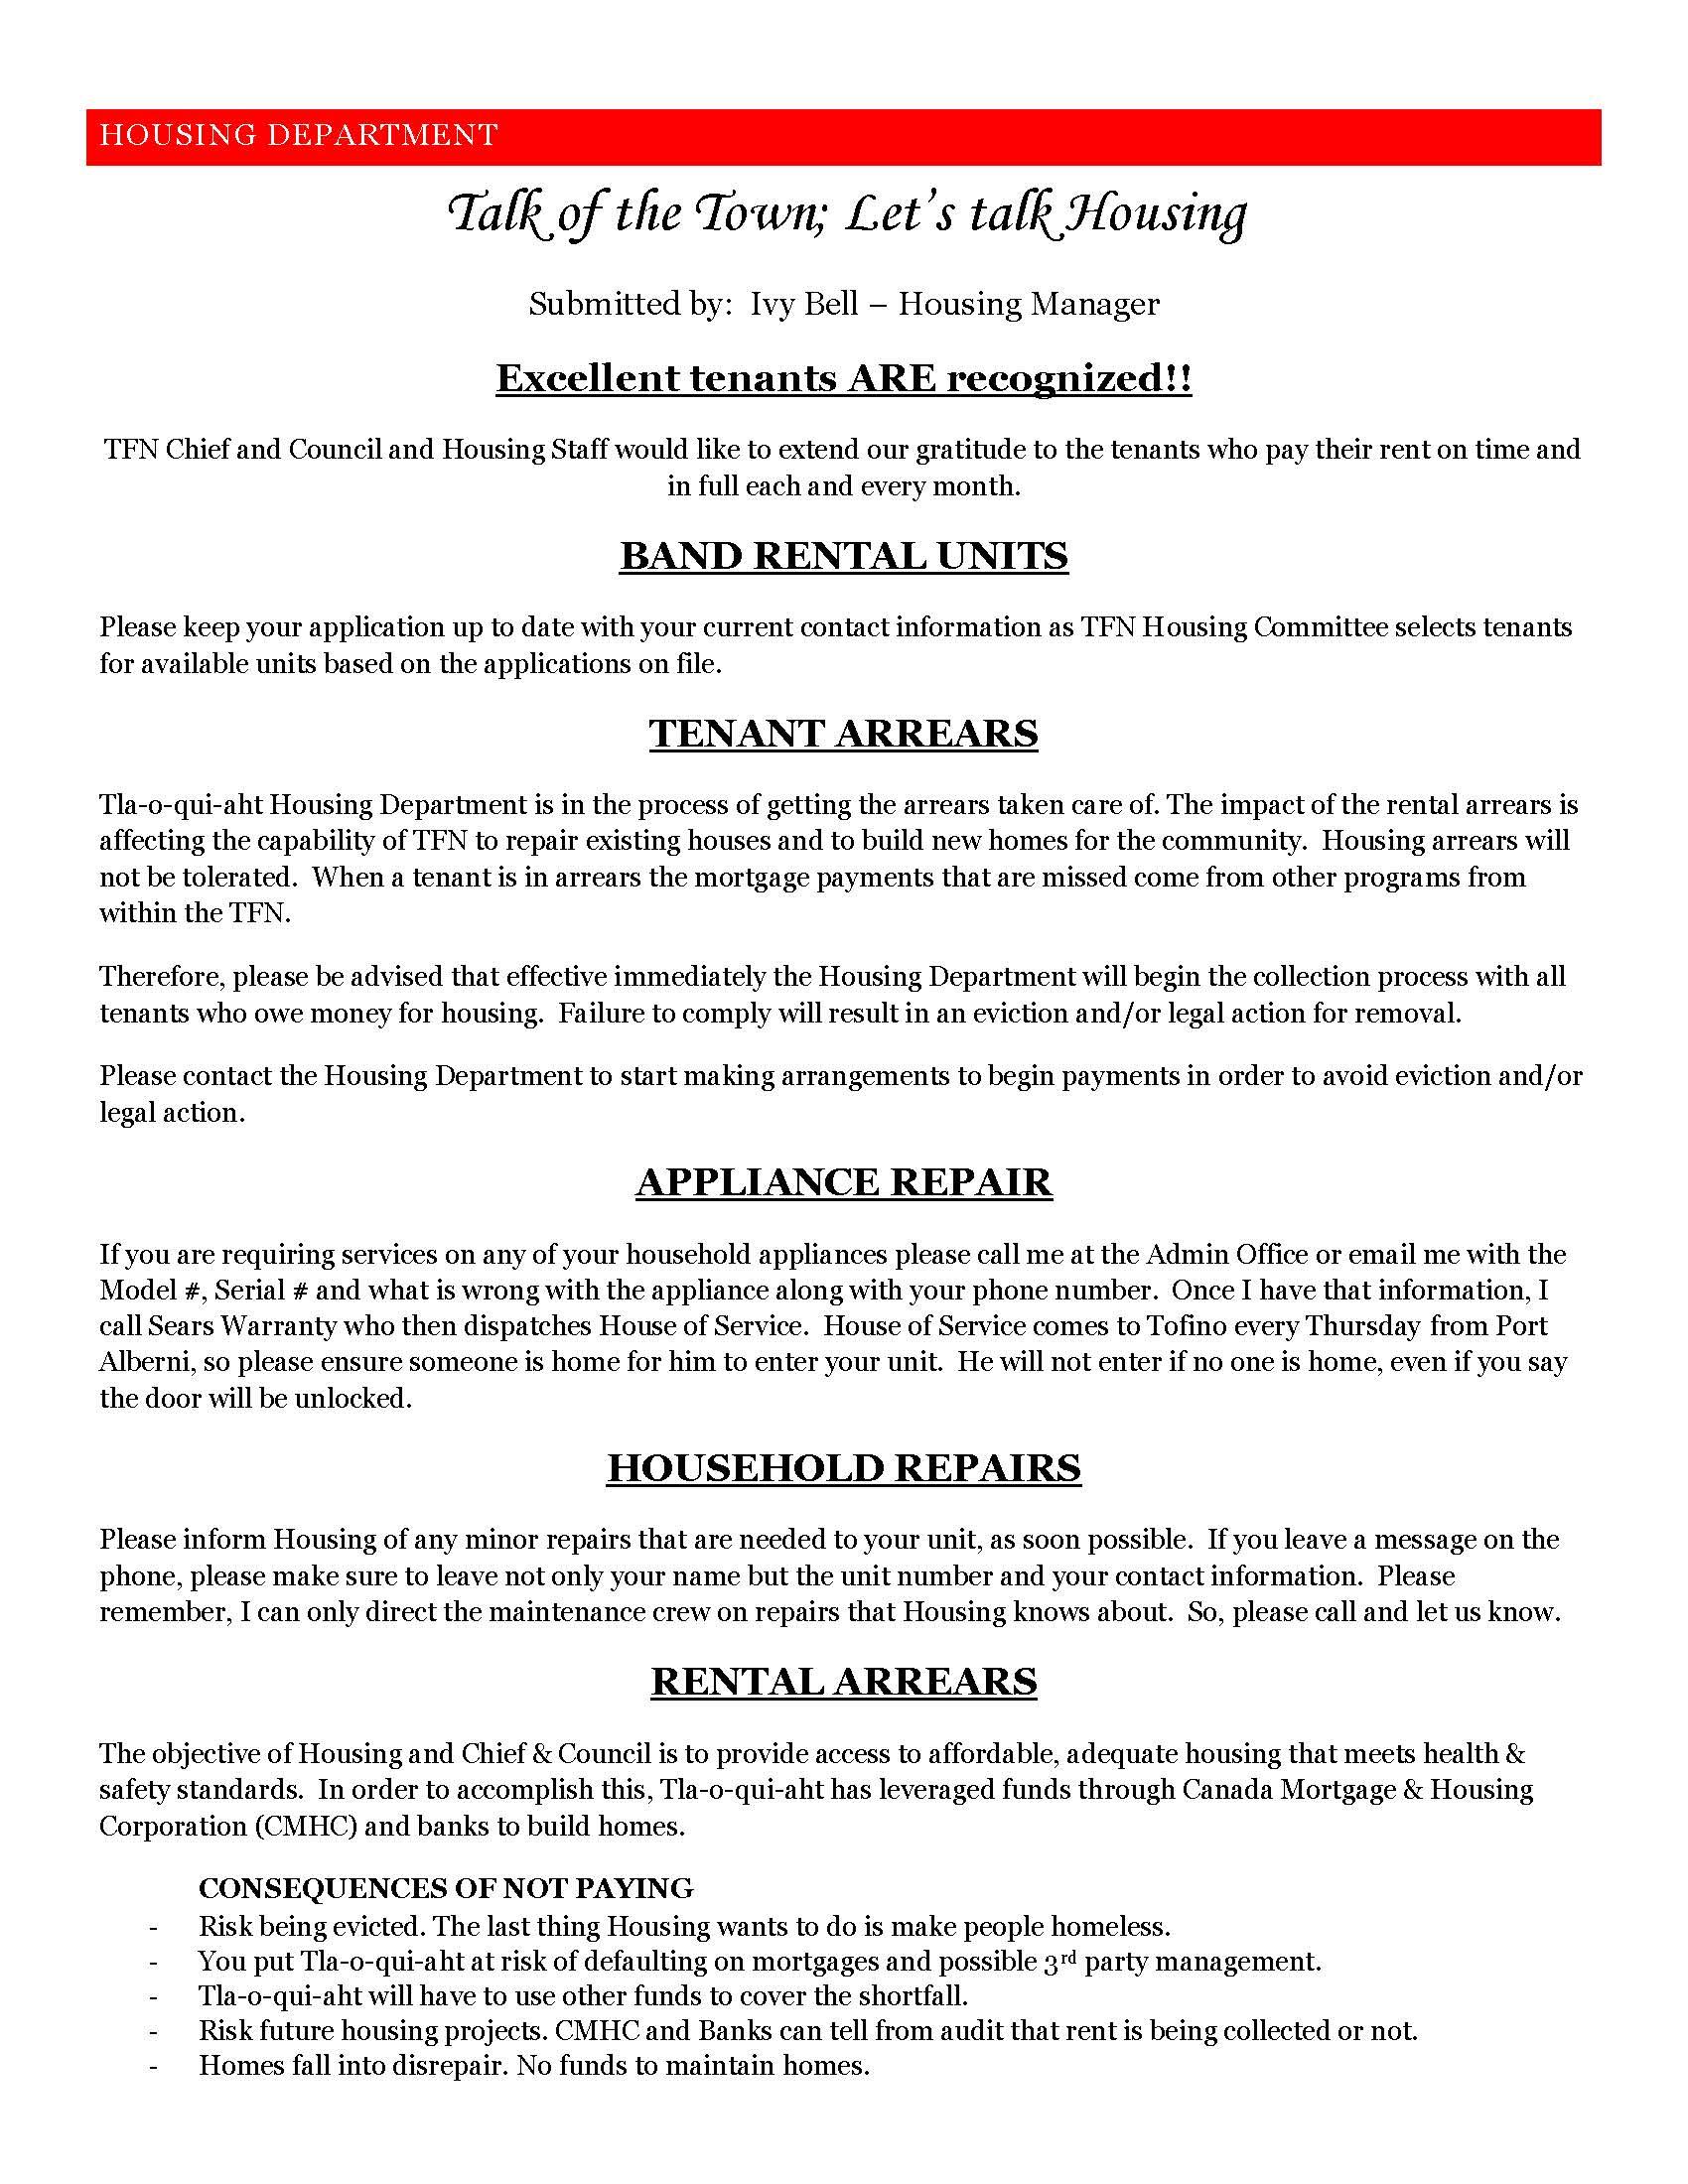 TFN Bulletin March 1 2017_Page_04.jpg